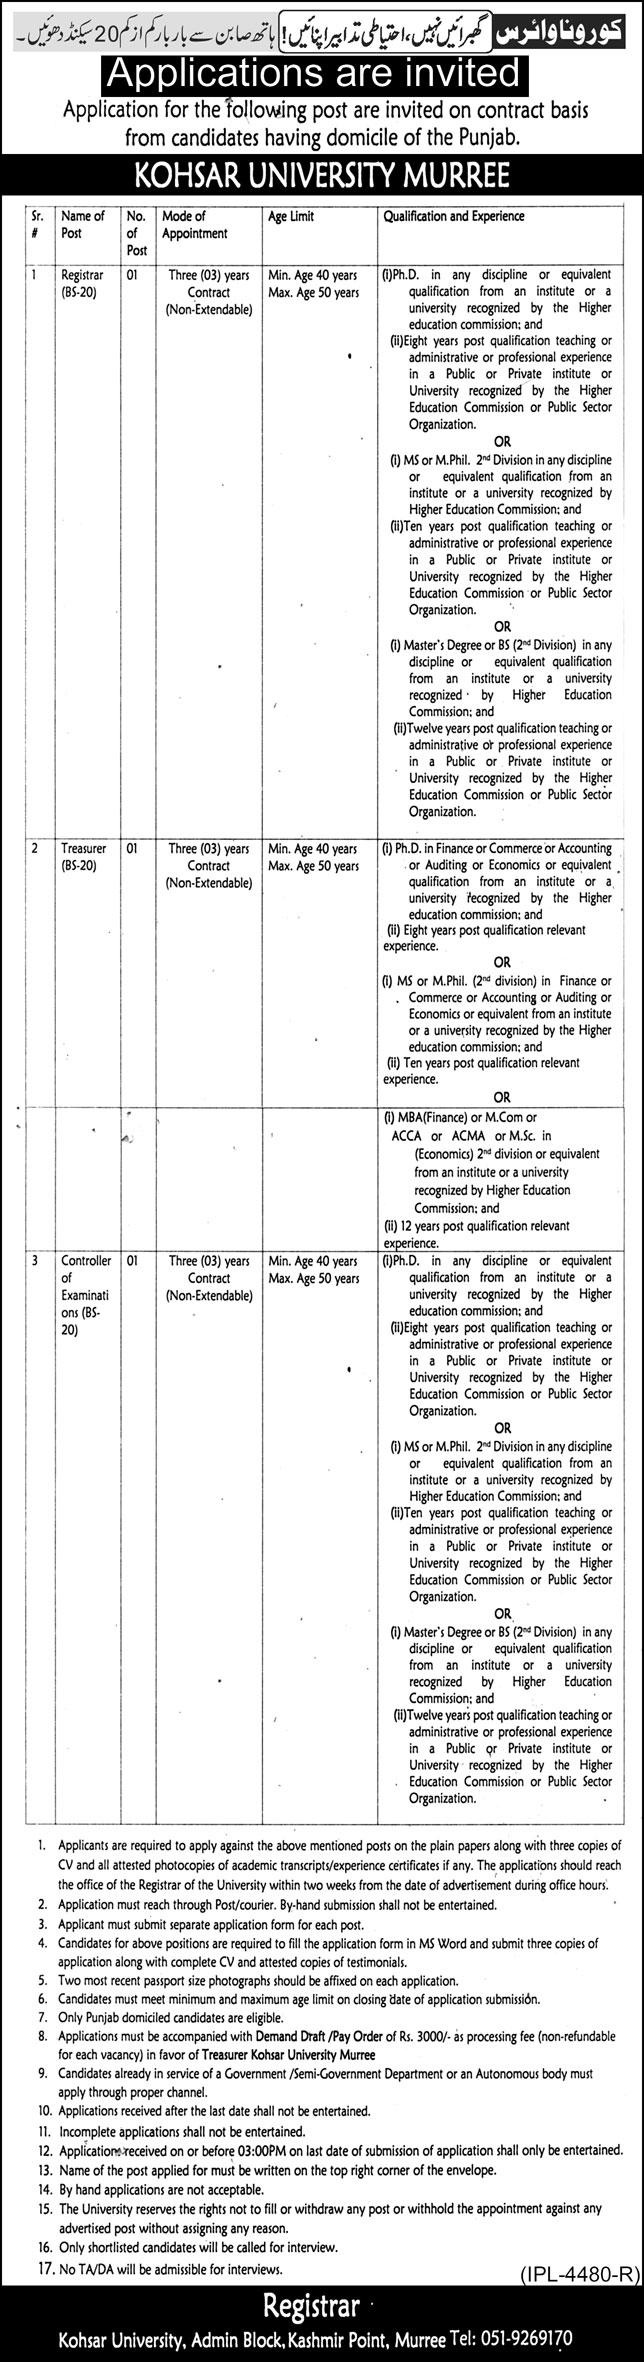 Latest Jobs In Kohsar University Murree 2021- Jobspk14.com